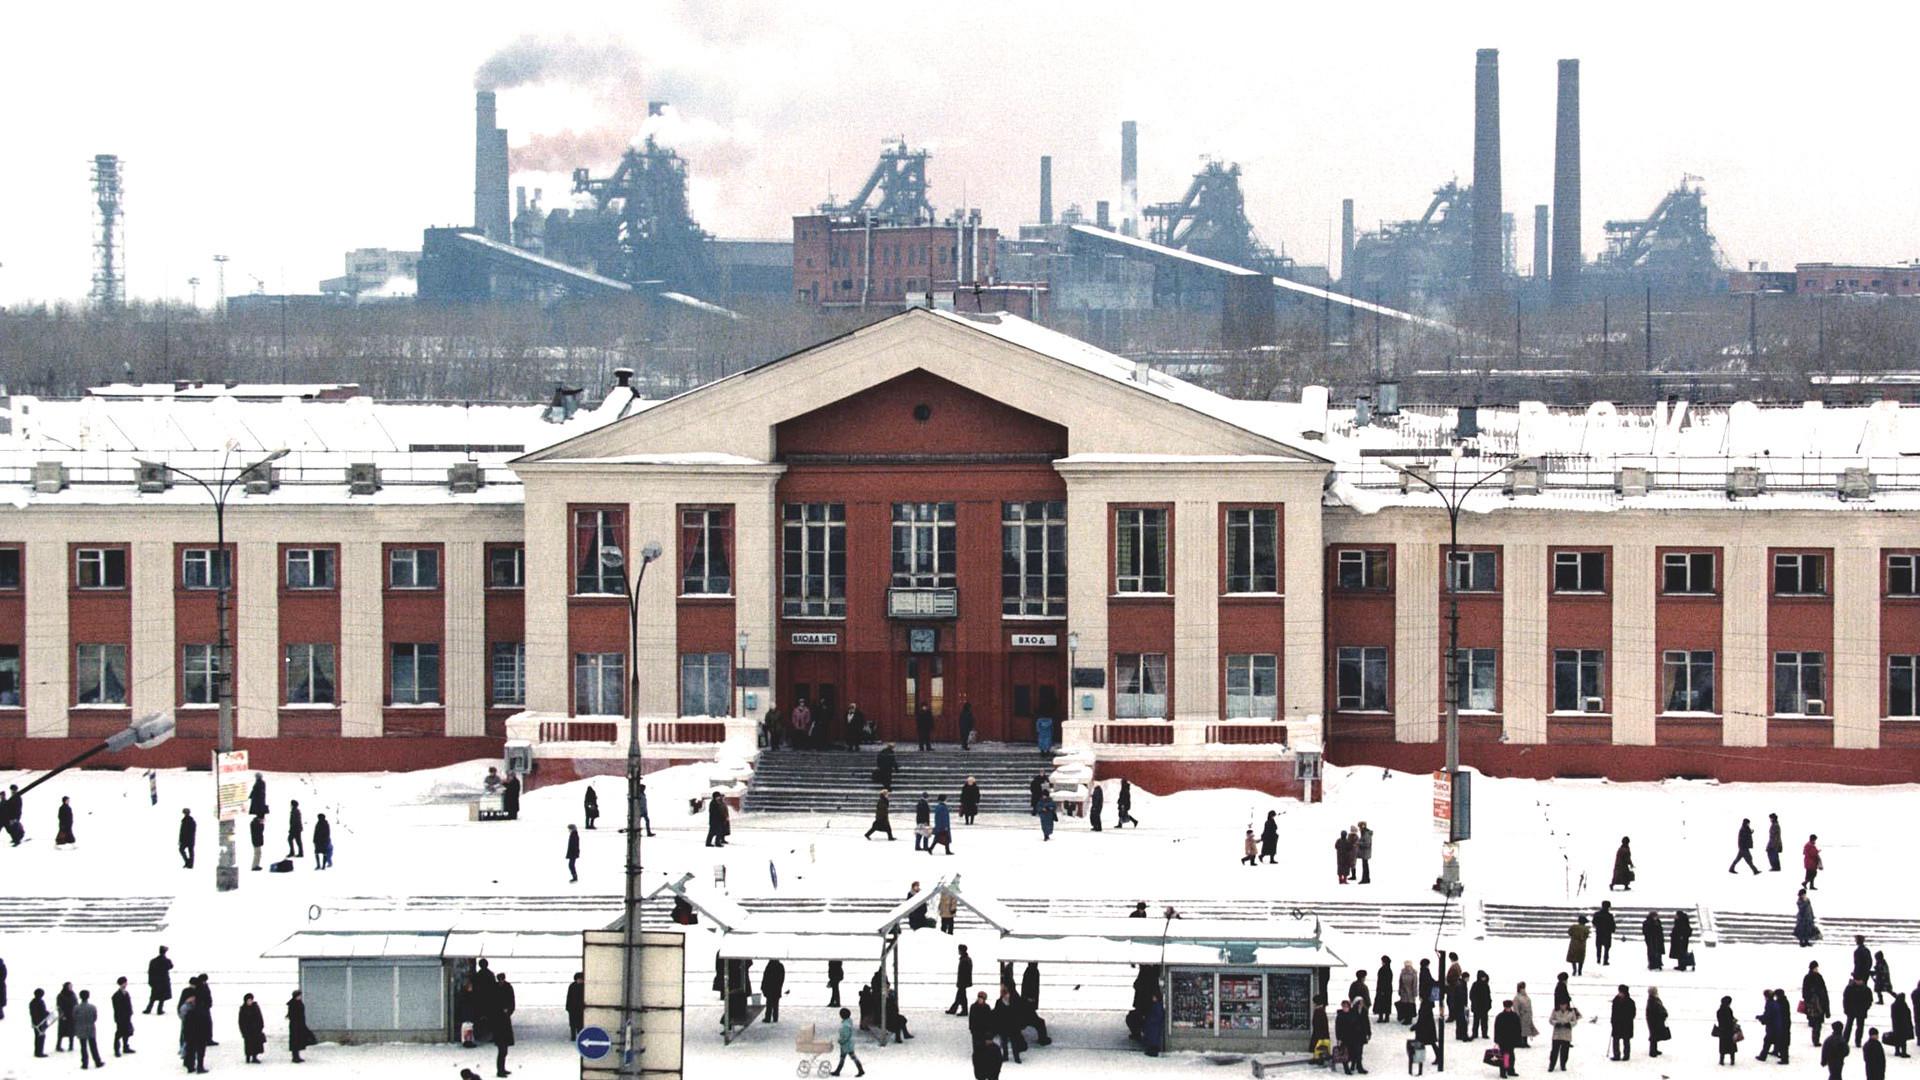 Željeznički kolodvor u Nižnjem Tagilu, Sverdslovska oblast.